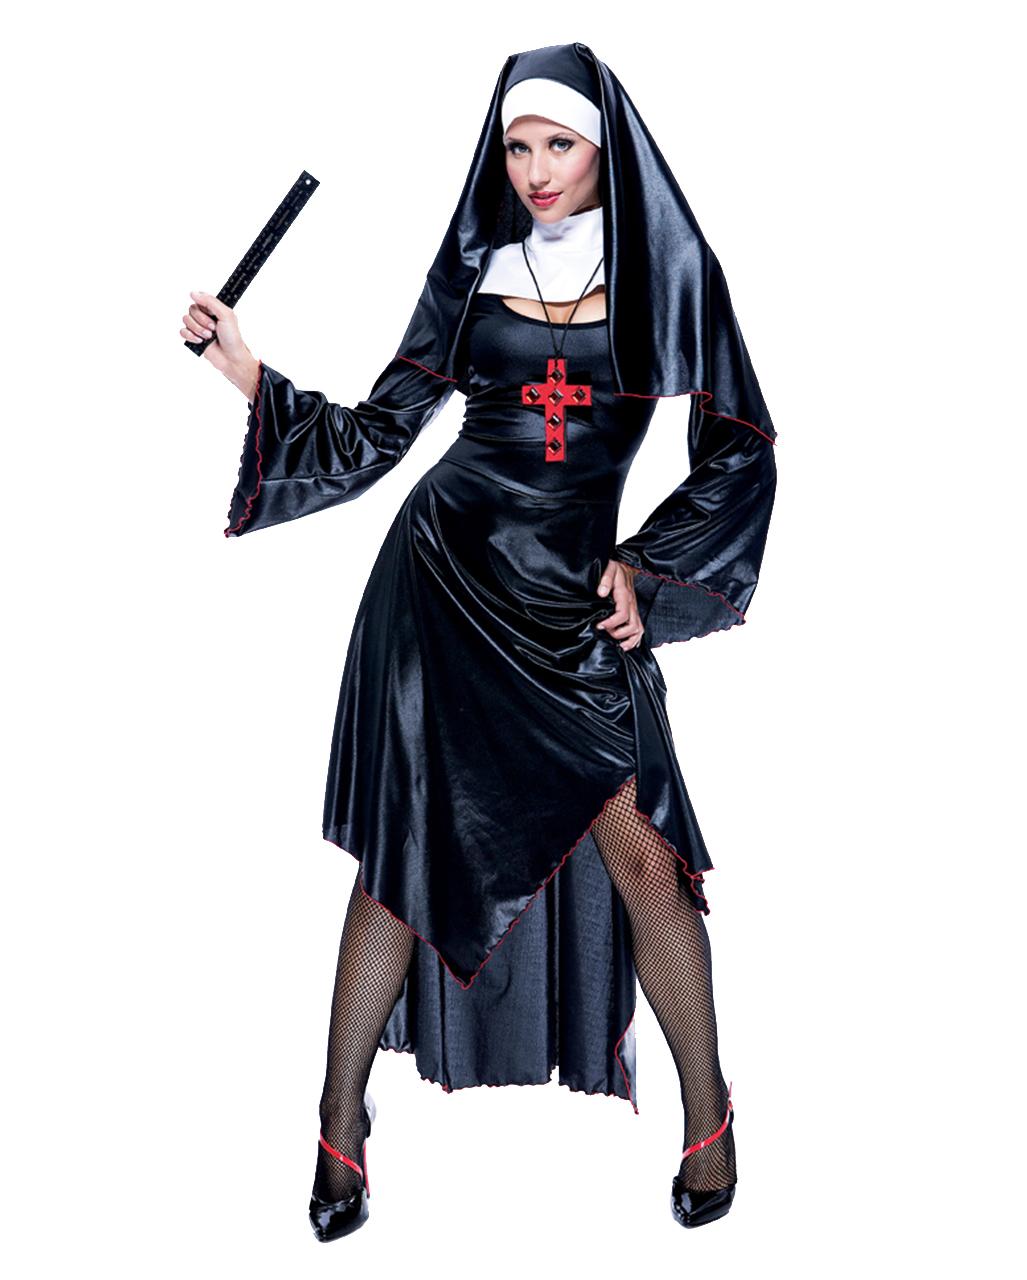 Frivoles Nonnen Kostum Ordensschwester Kostum Horror Shop Com